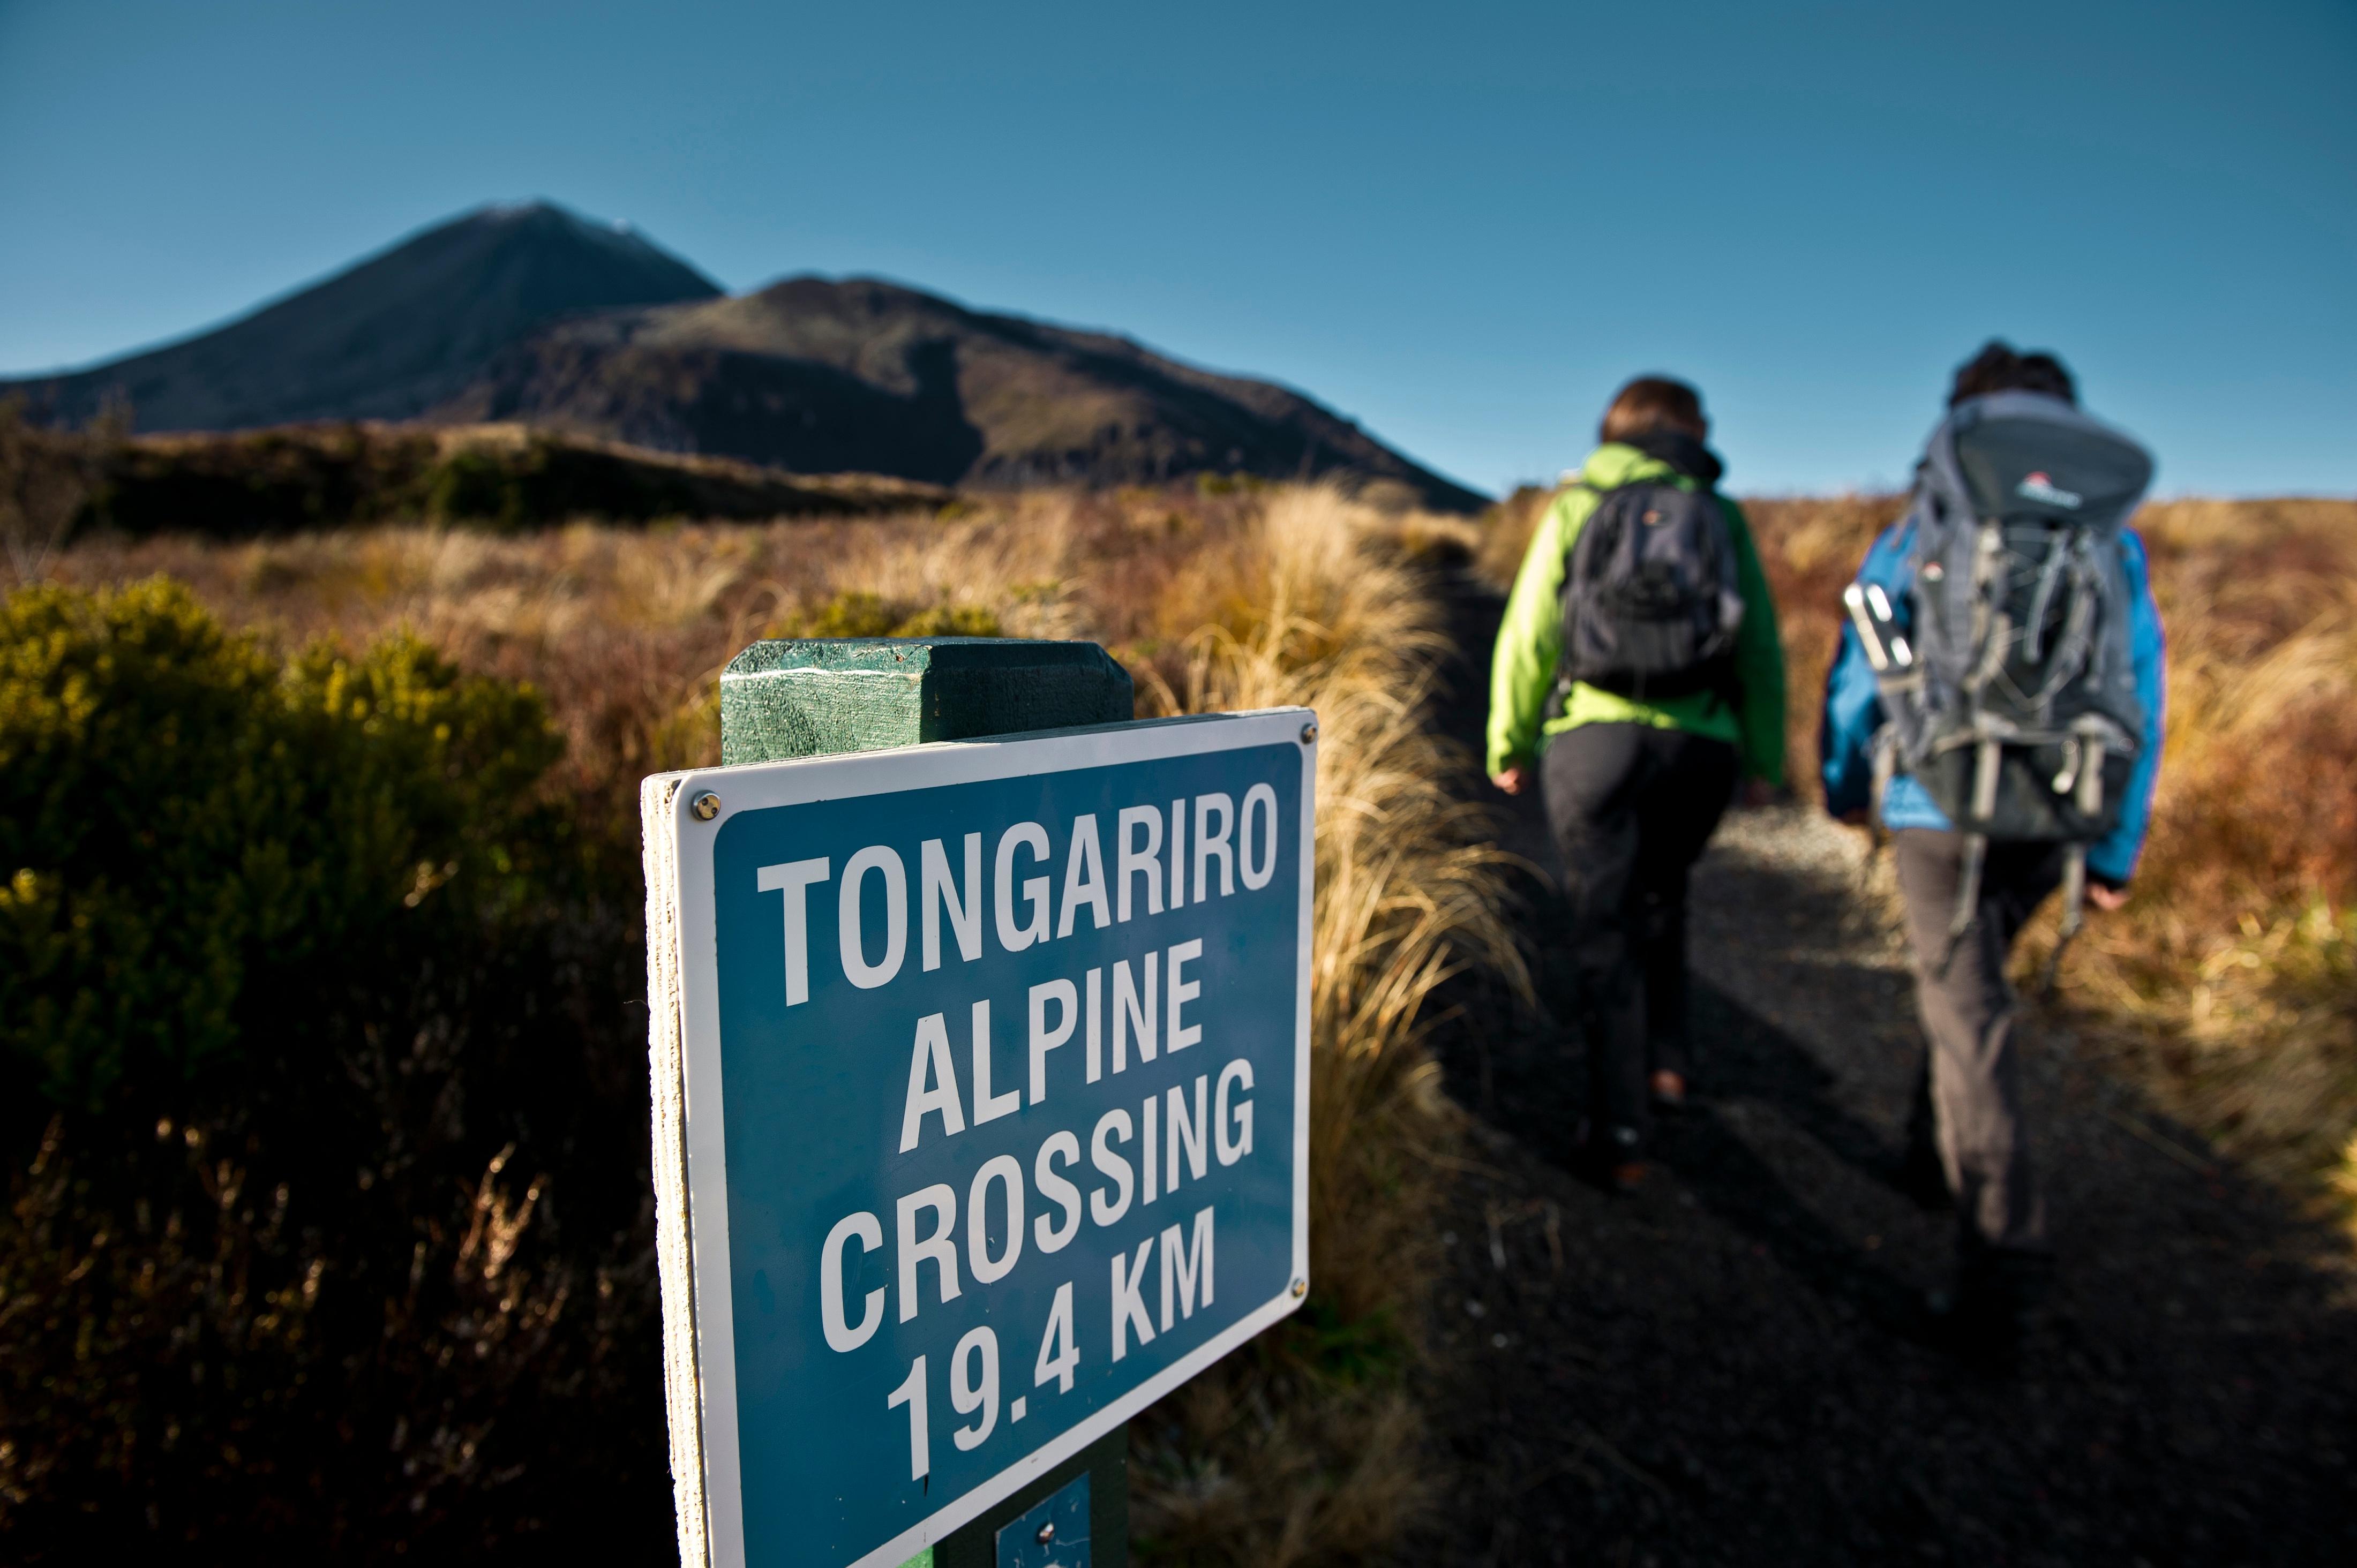 Tongariro Alpine Crossing with Discovery